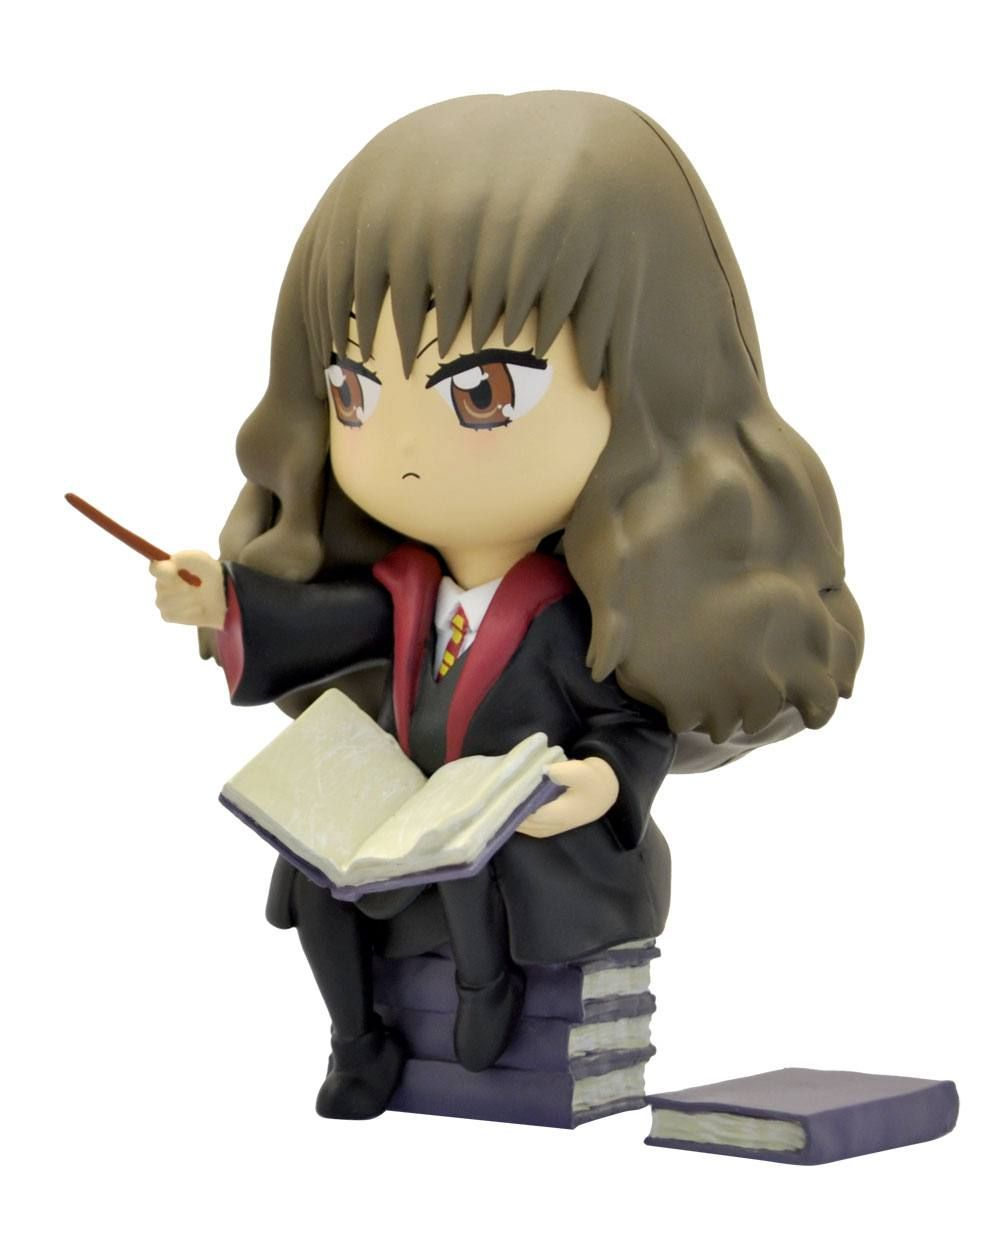 Harry Potter Figure Hermione Granger Studying A Spell 13 cm Plastoy